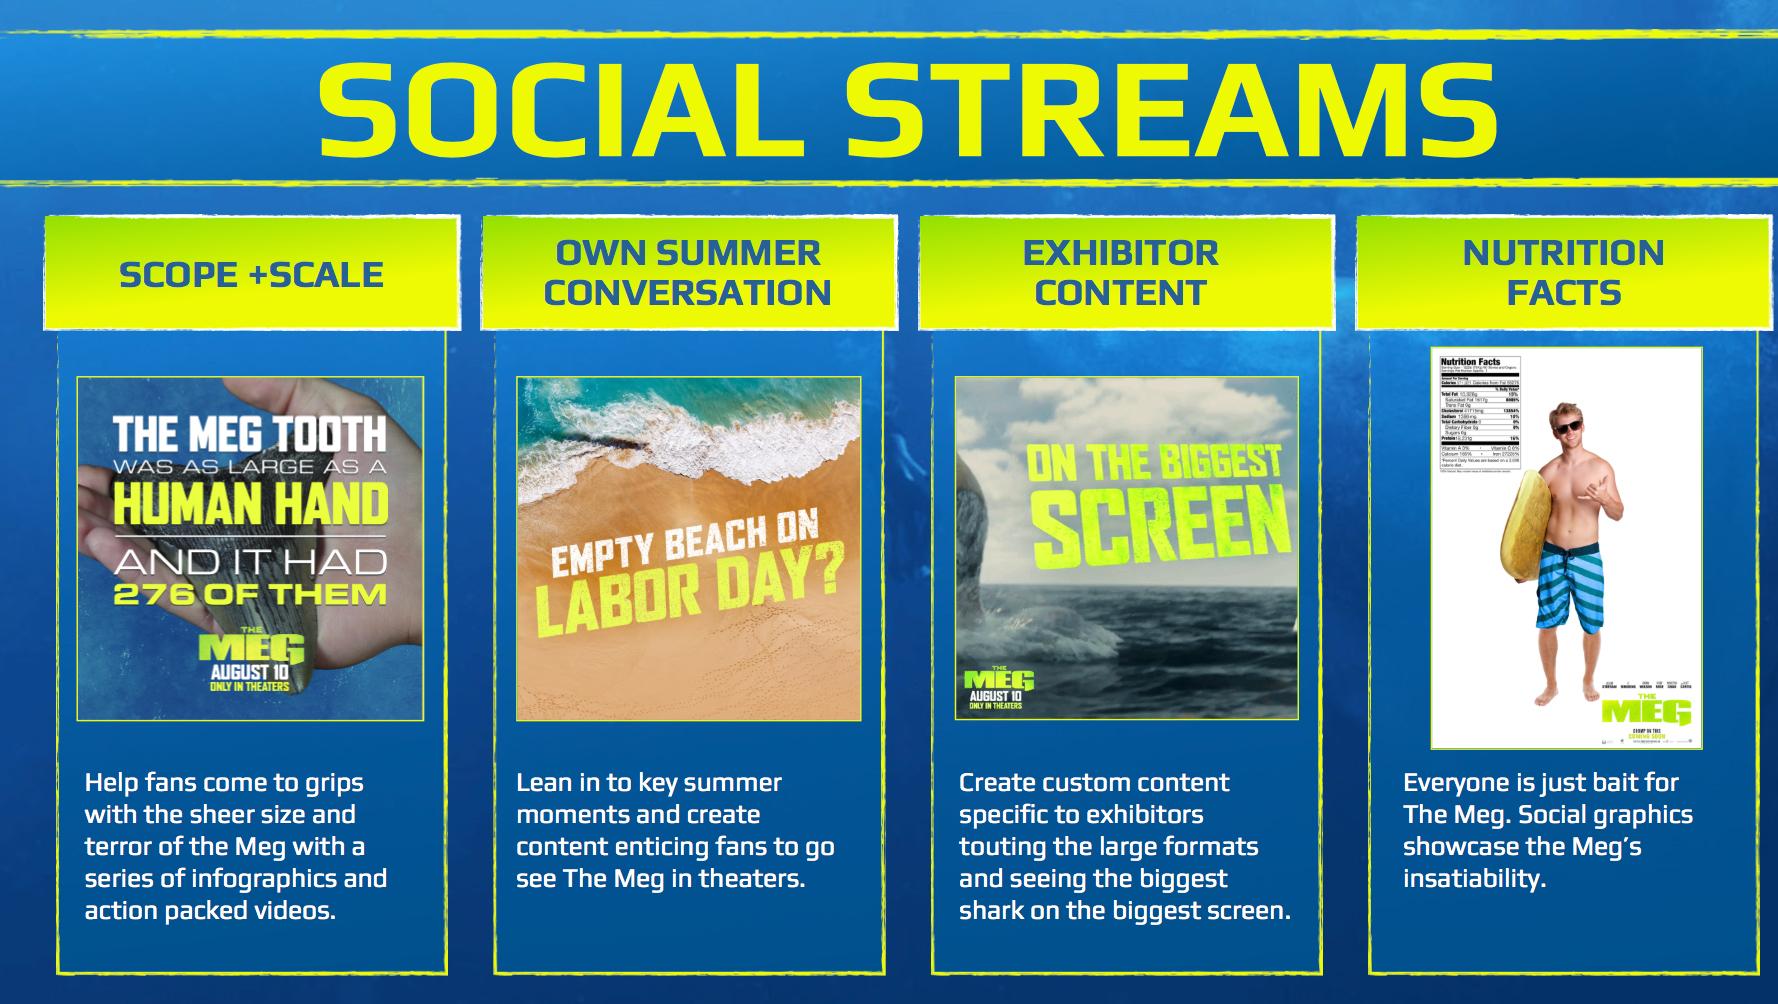 The Meg Digital Marketing Campaign - The Shorty Awards